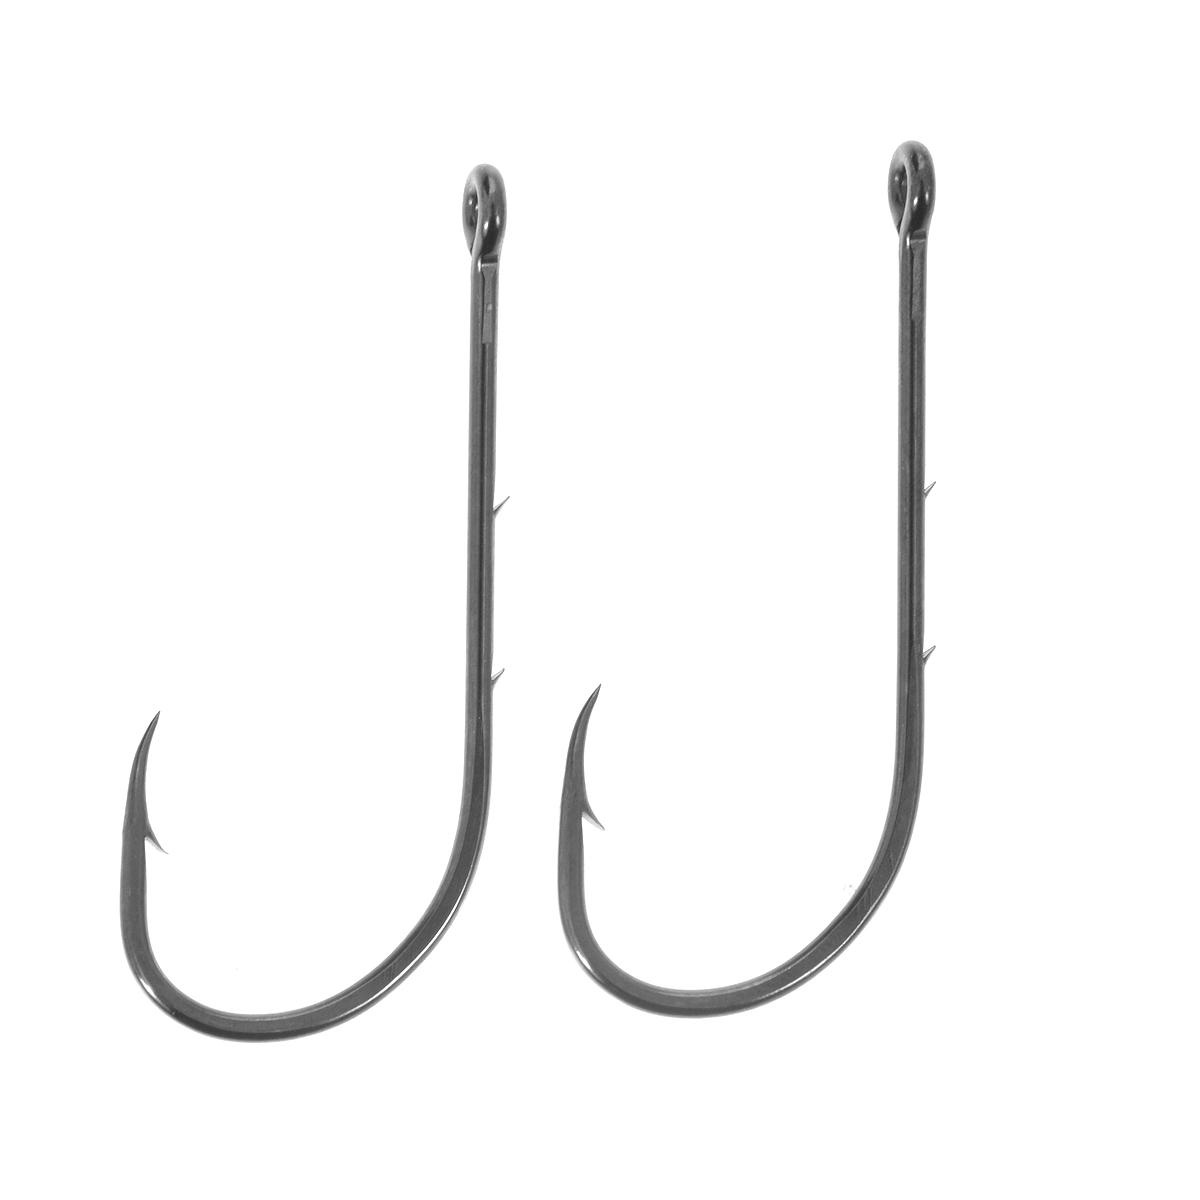 Крючки рыболовные Cobra Baitholder, цвет: черный, размер 10/0, 2 шт